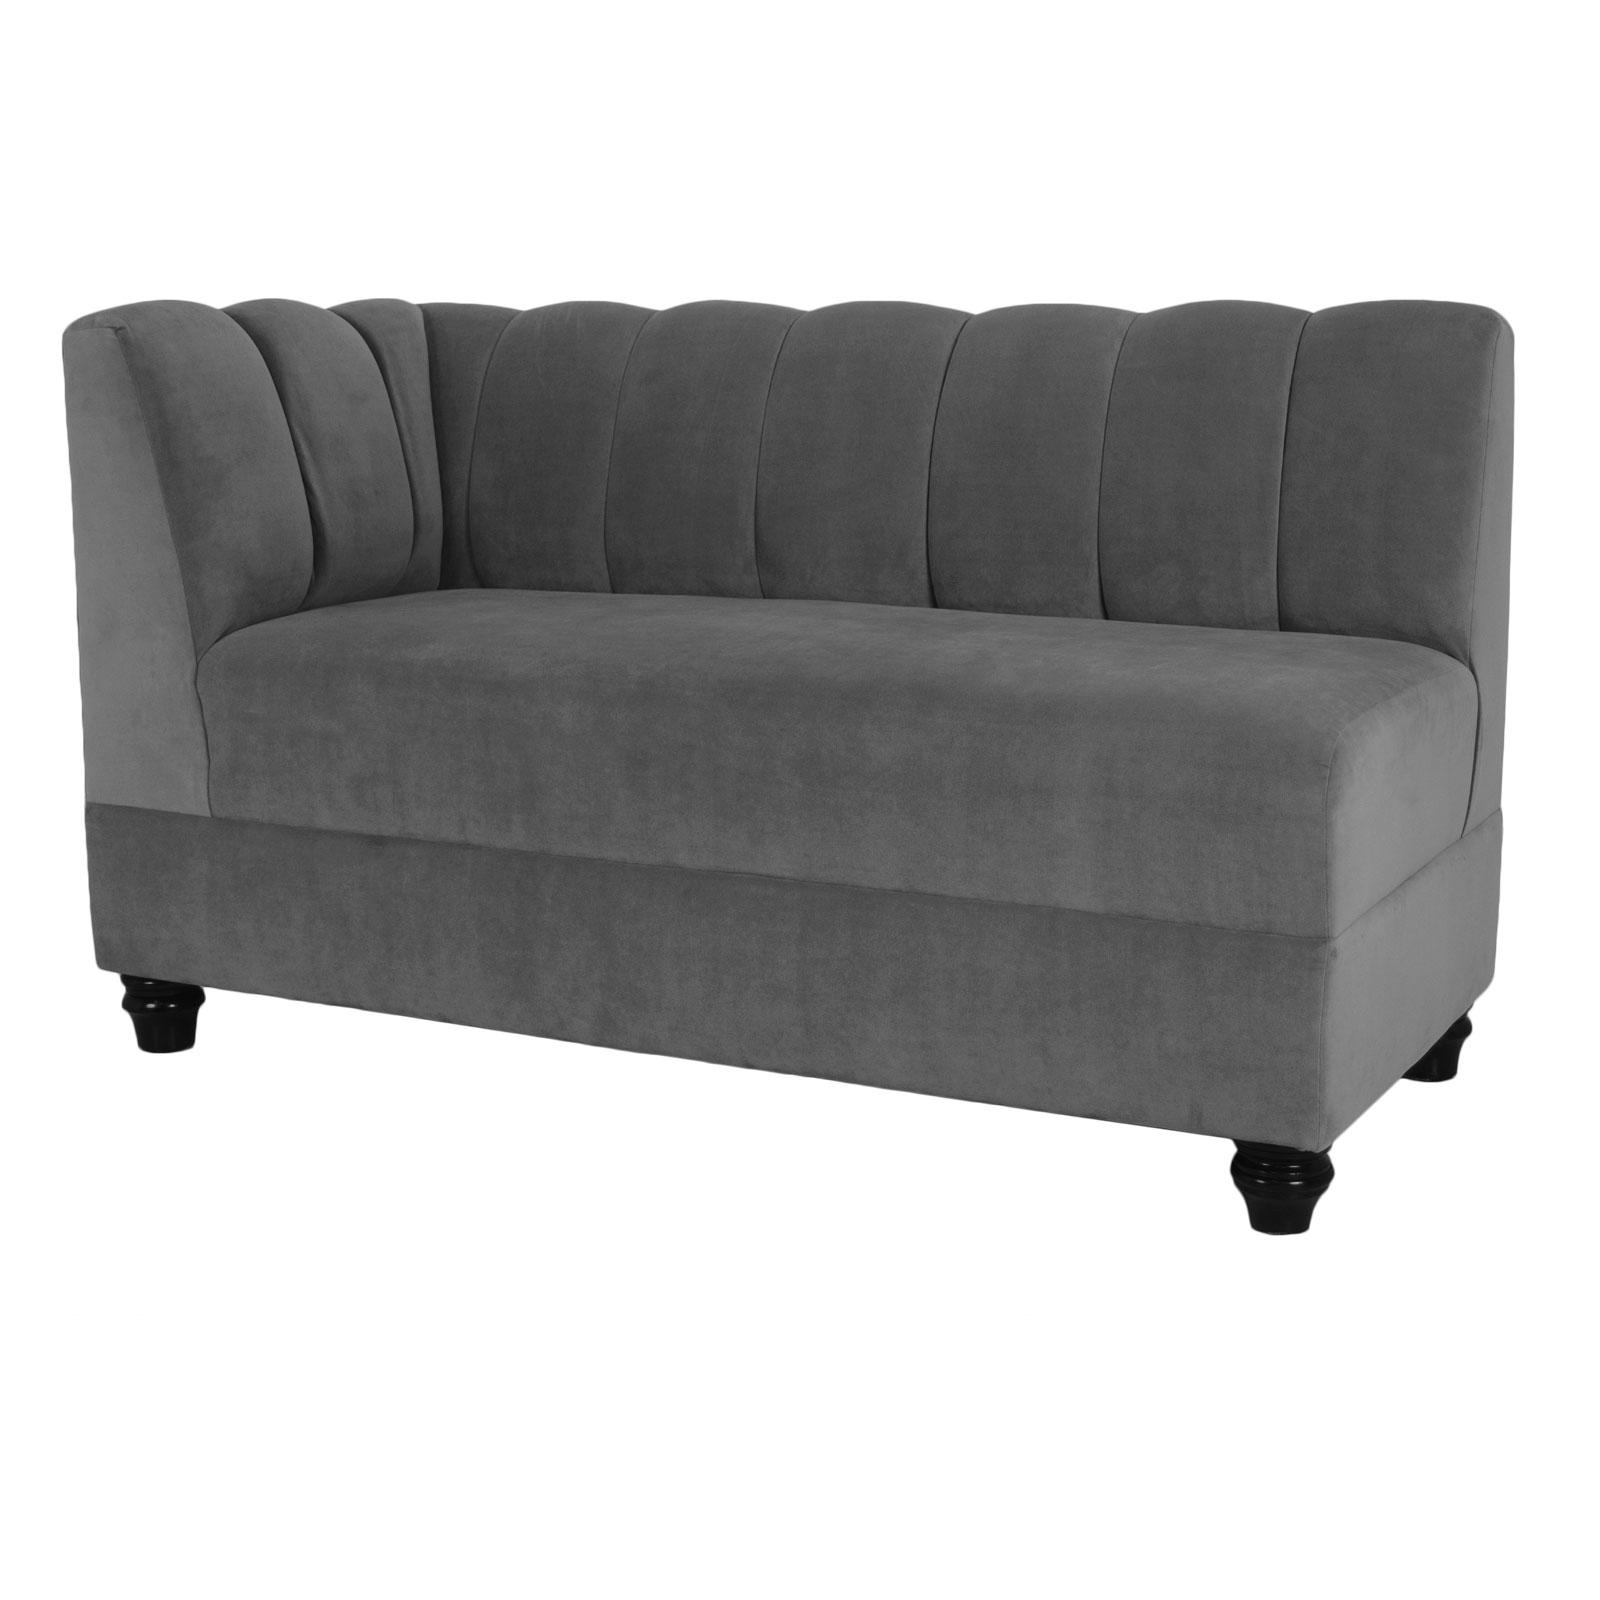 rental sofa ottawa senators boston bruins sofascore modular rentals event furniture delivery